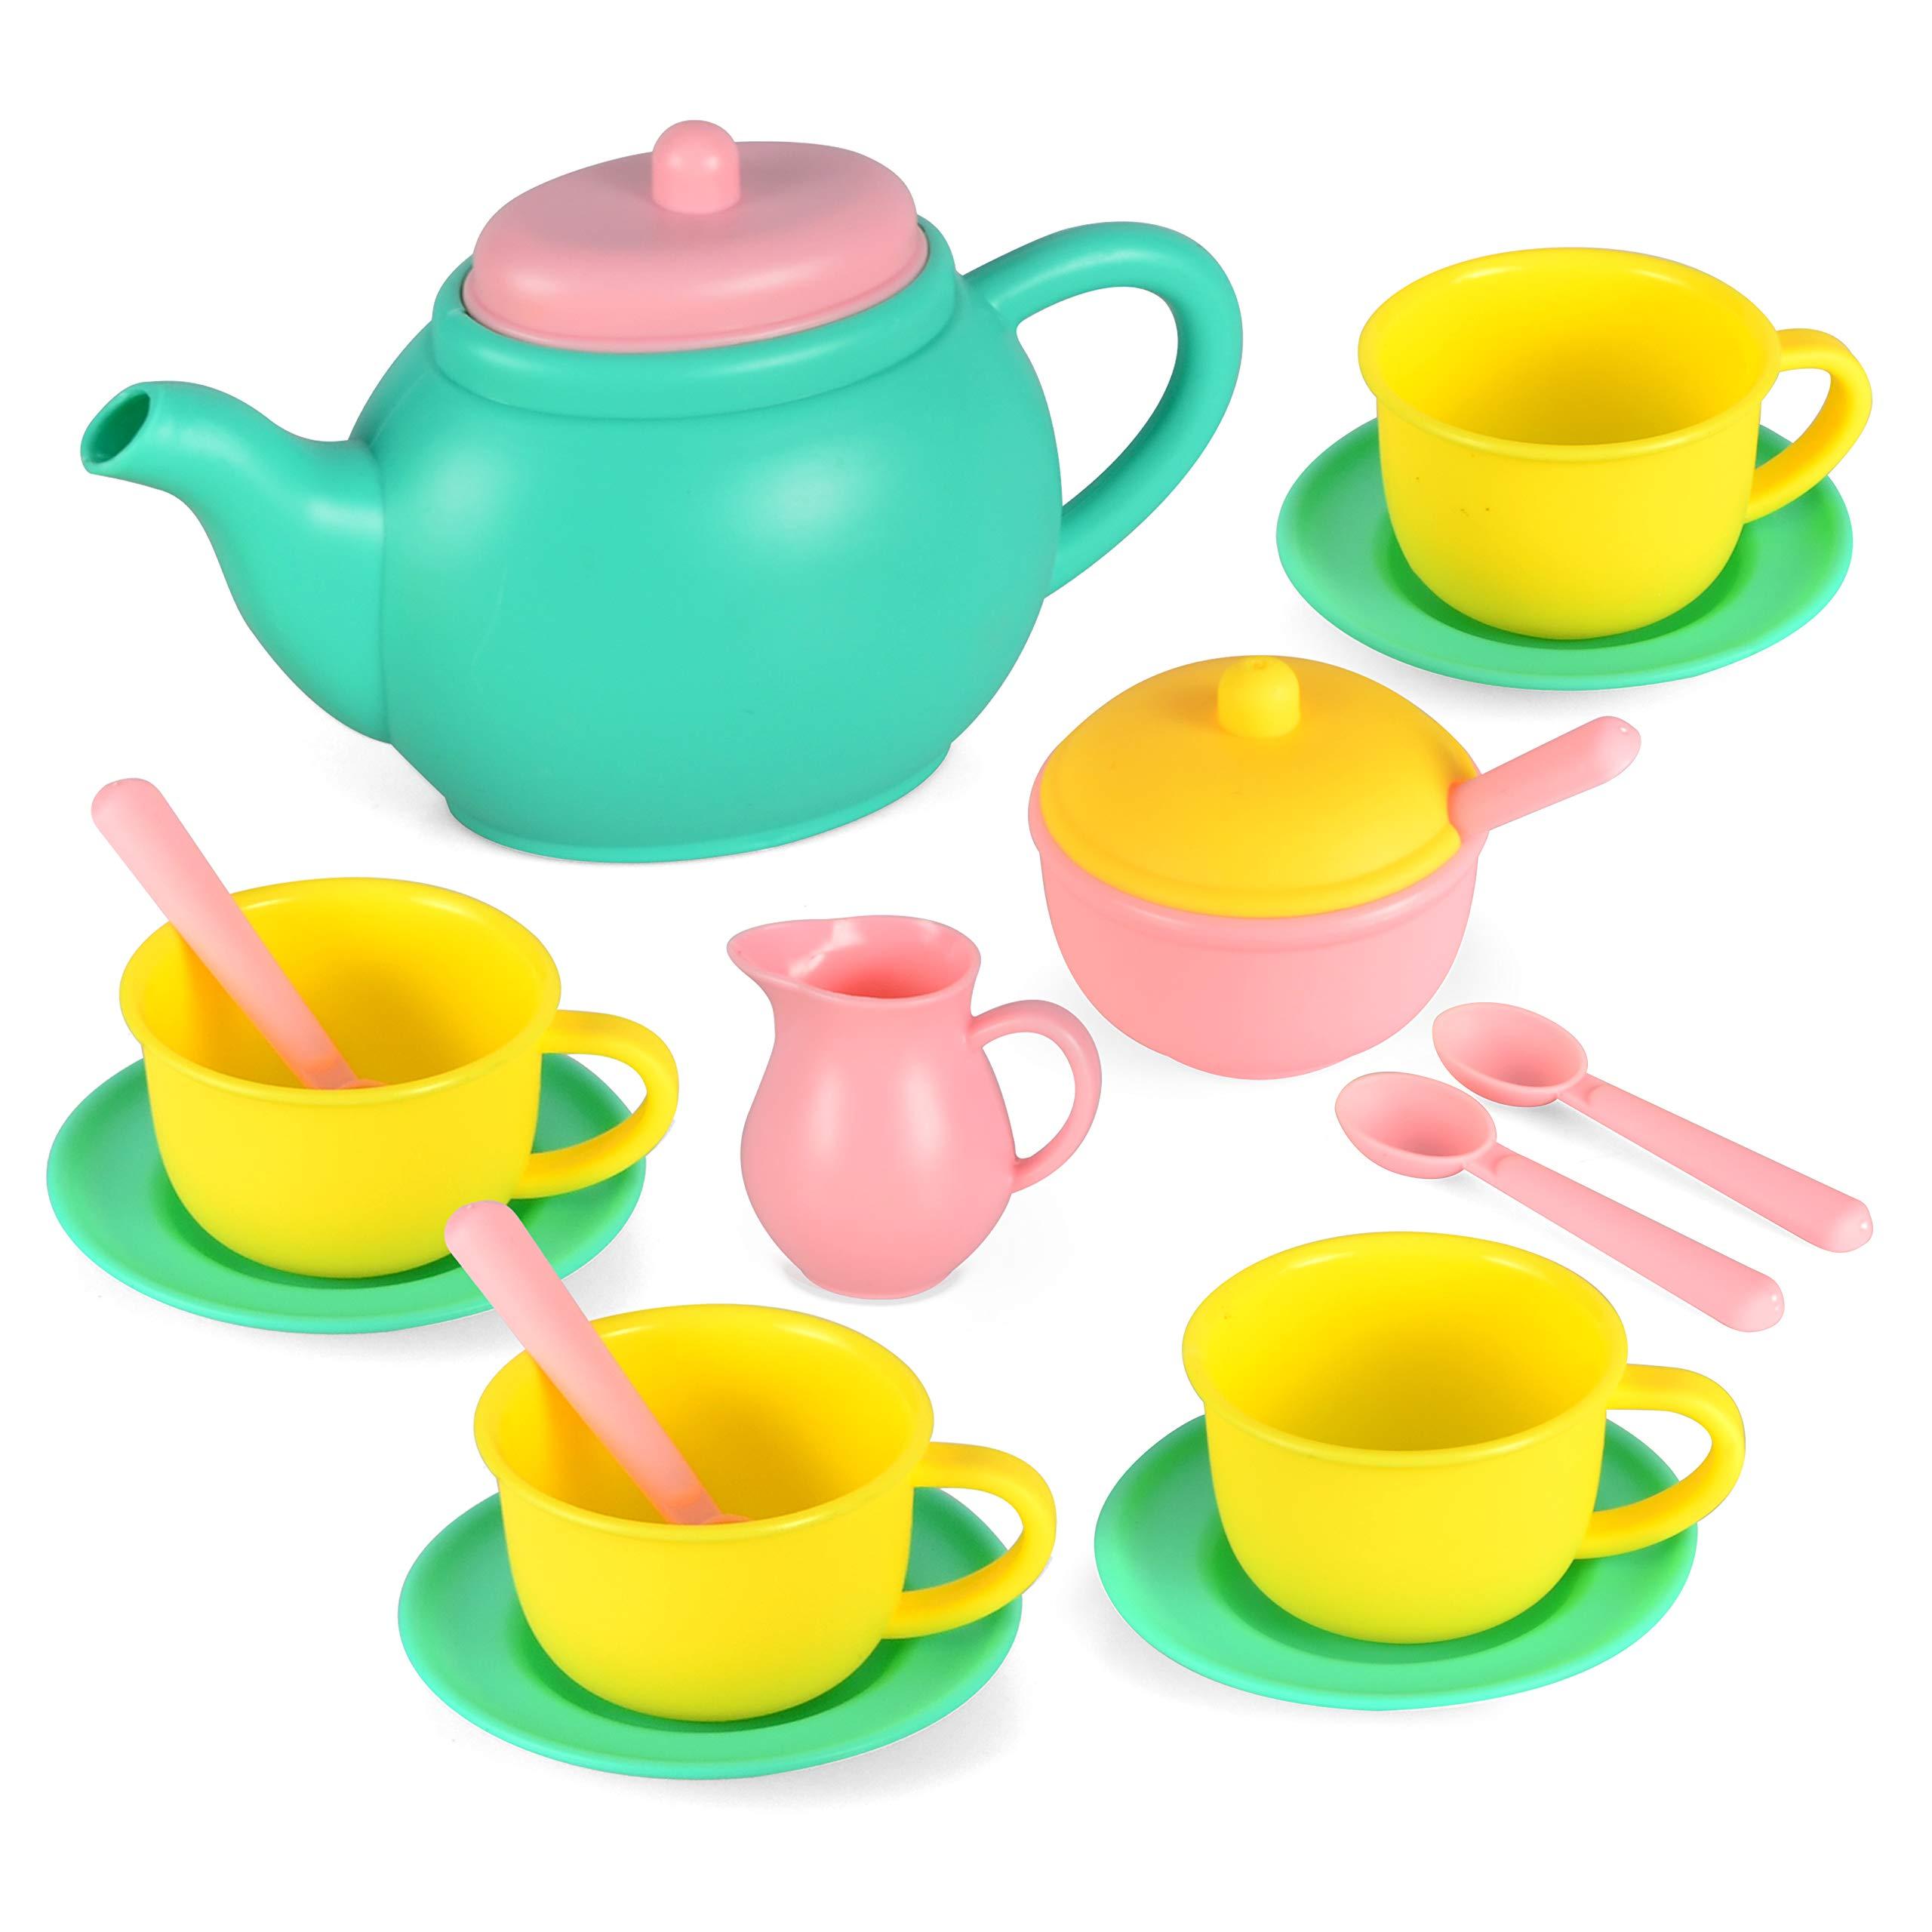 JOYIN Pretend Play Tea Party Set Play Food Accessories BPA Free Phthalates Free (Colors May Vary) by JOYIN